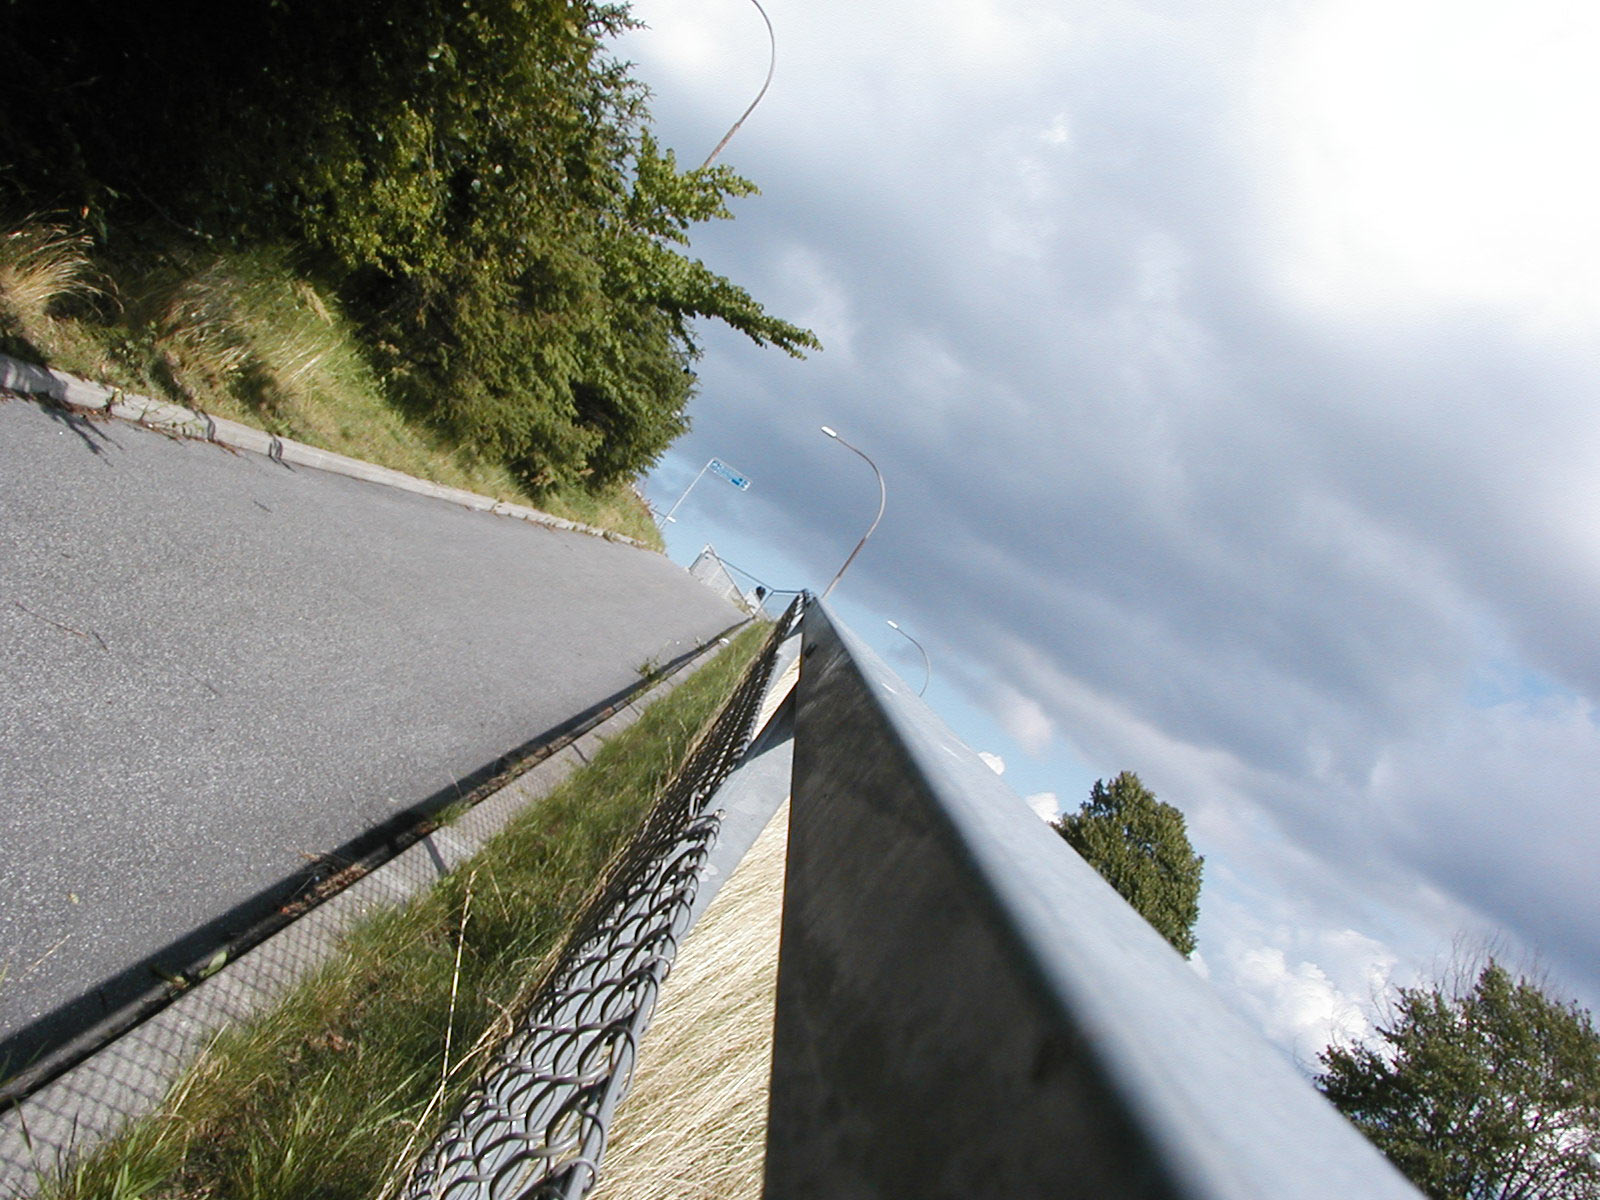 Asfalt walking path